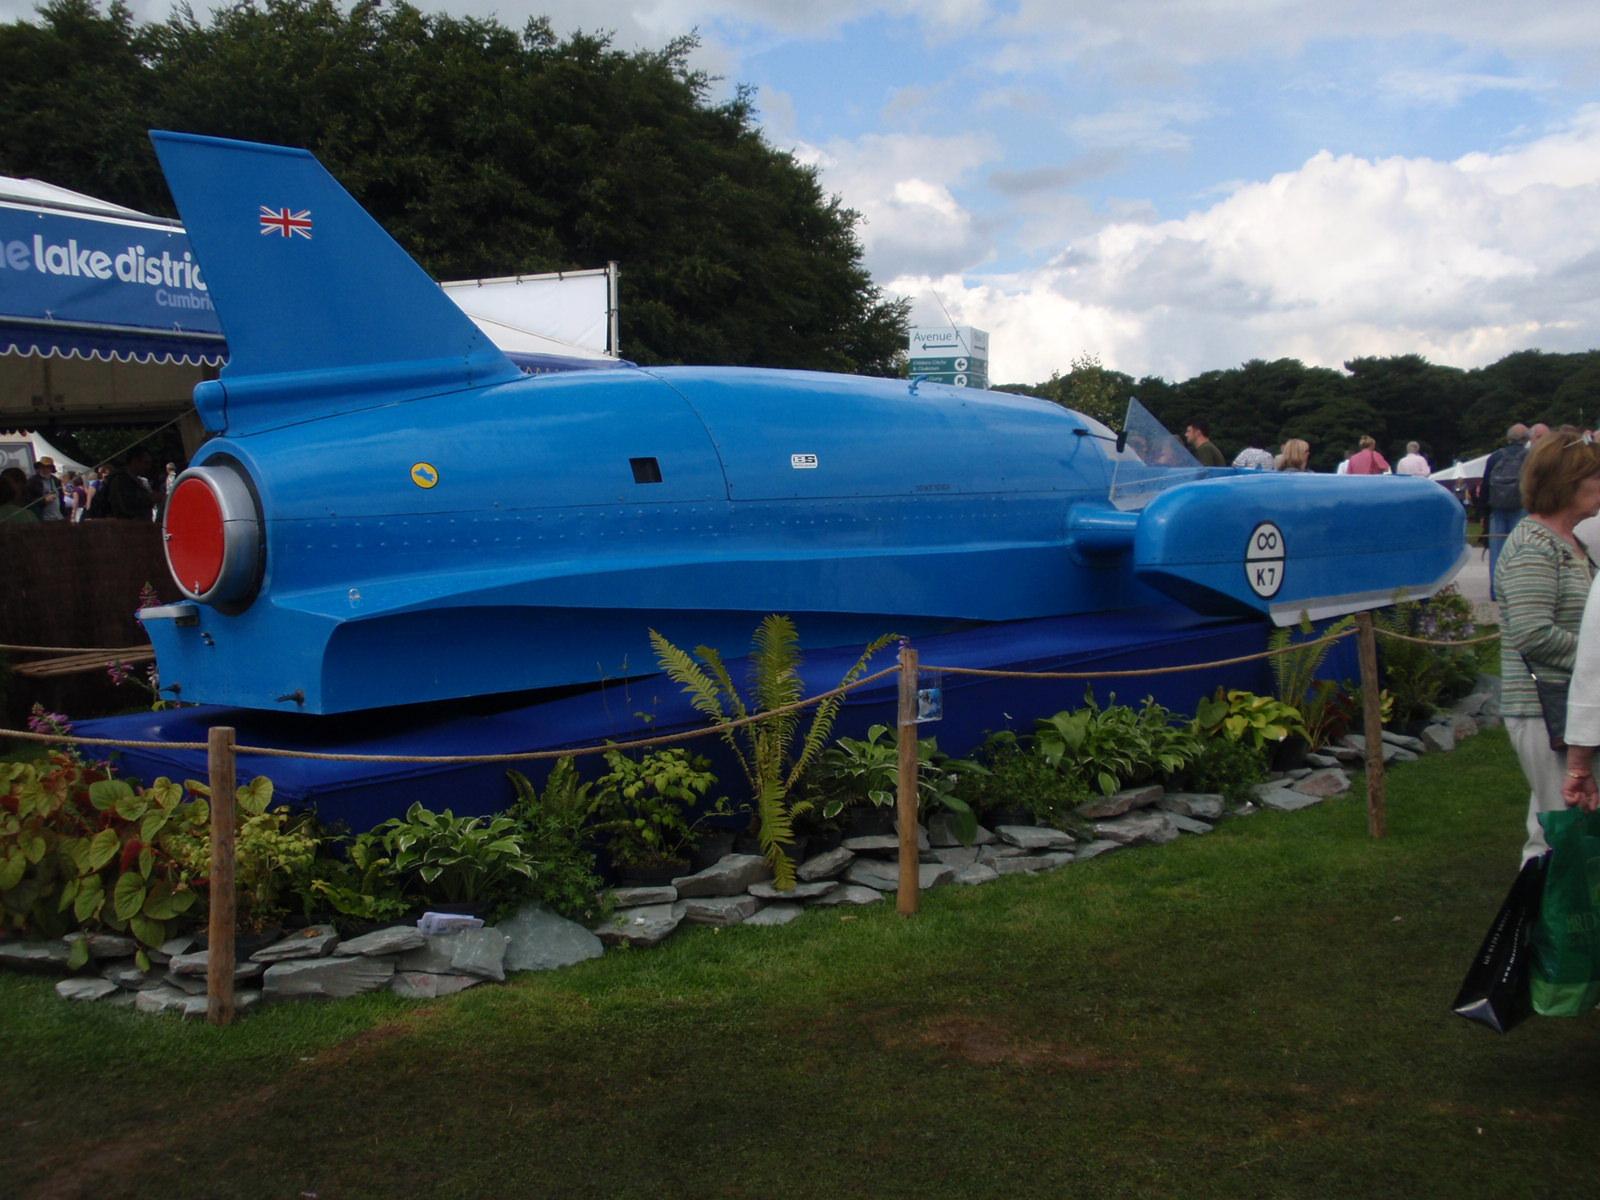 Bluebird speed dating